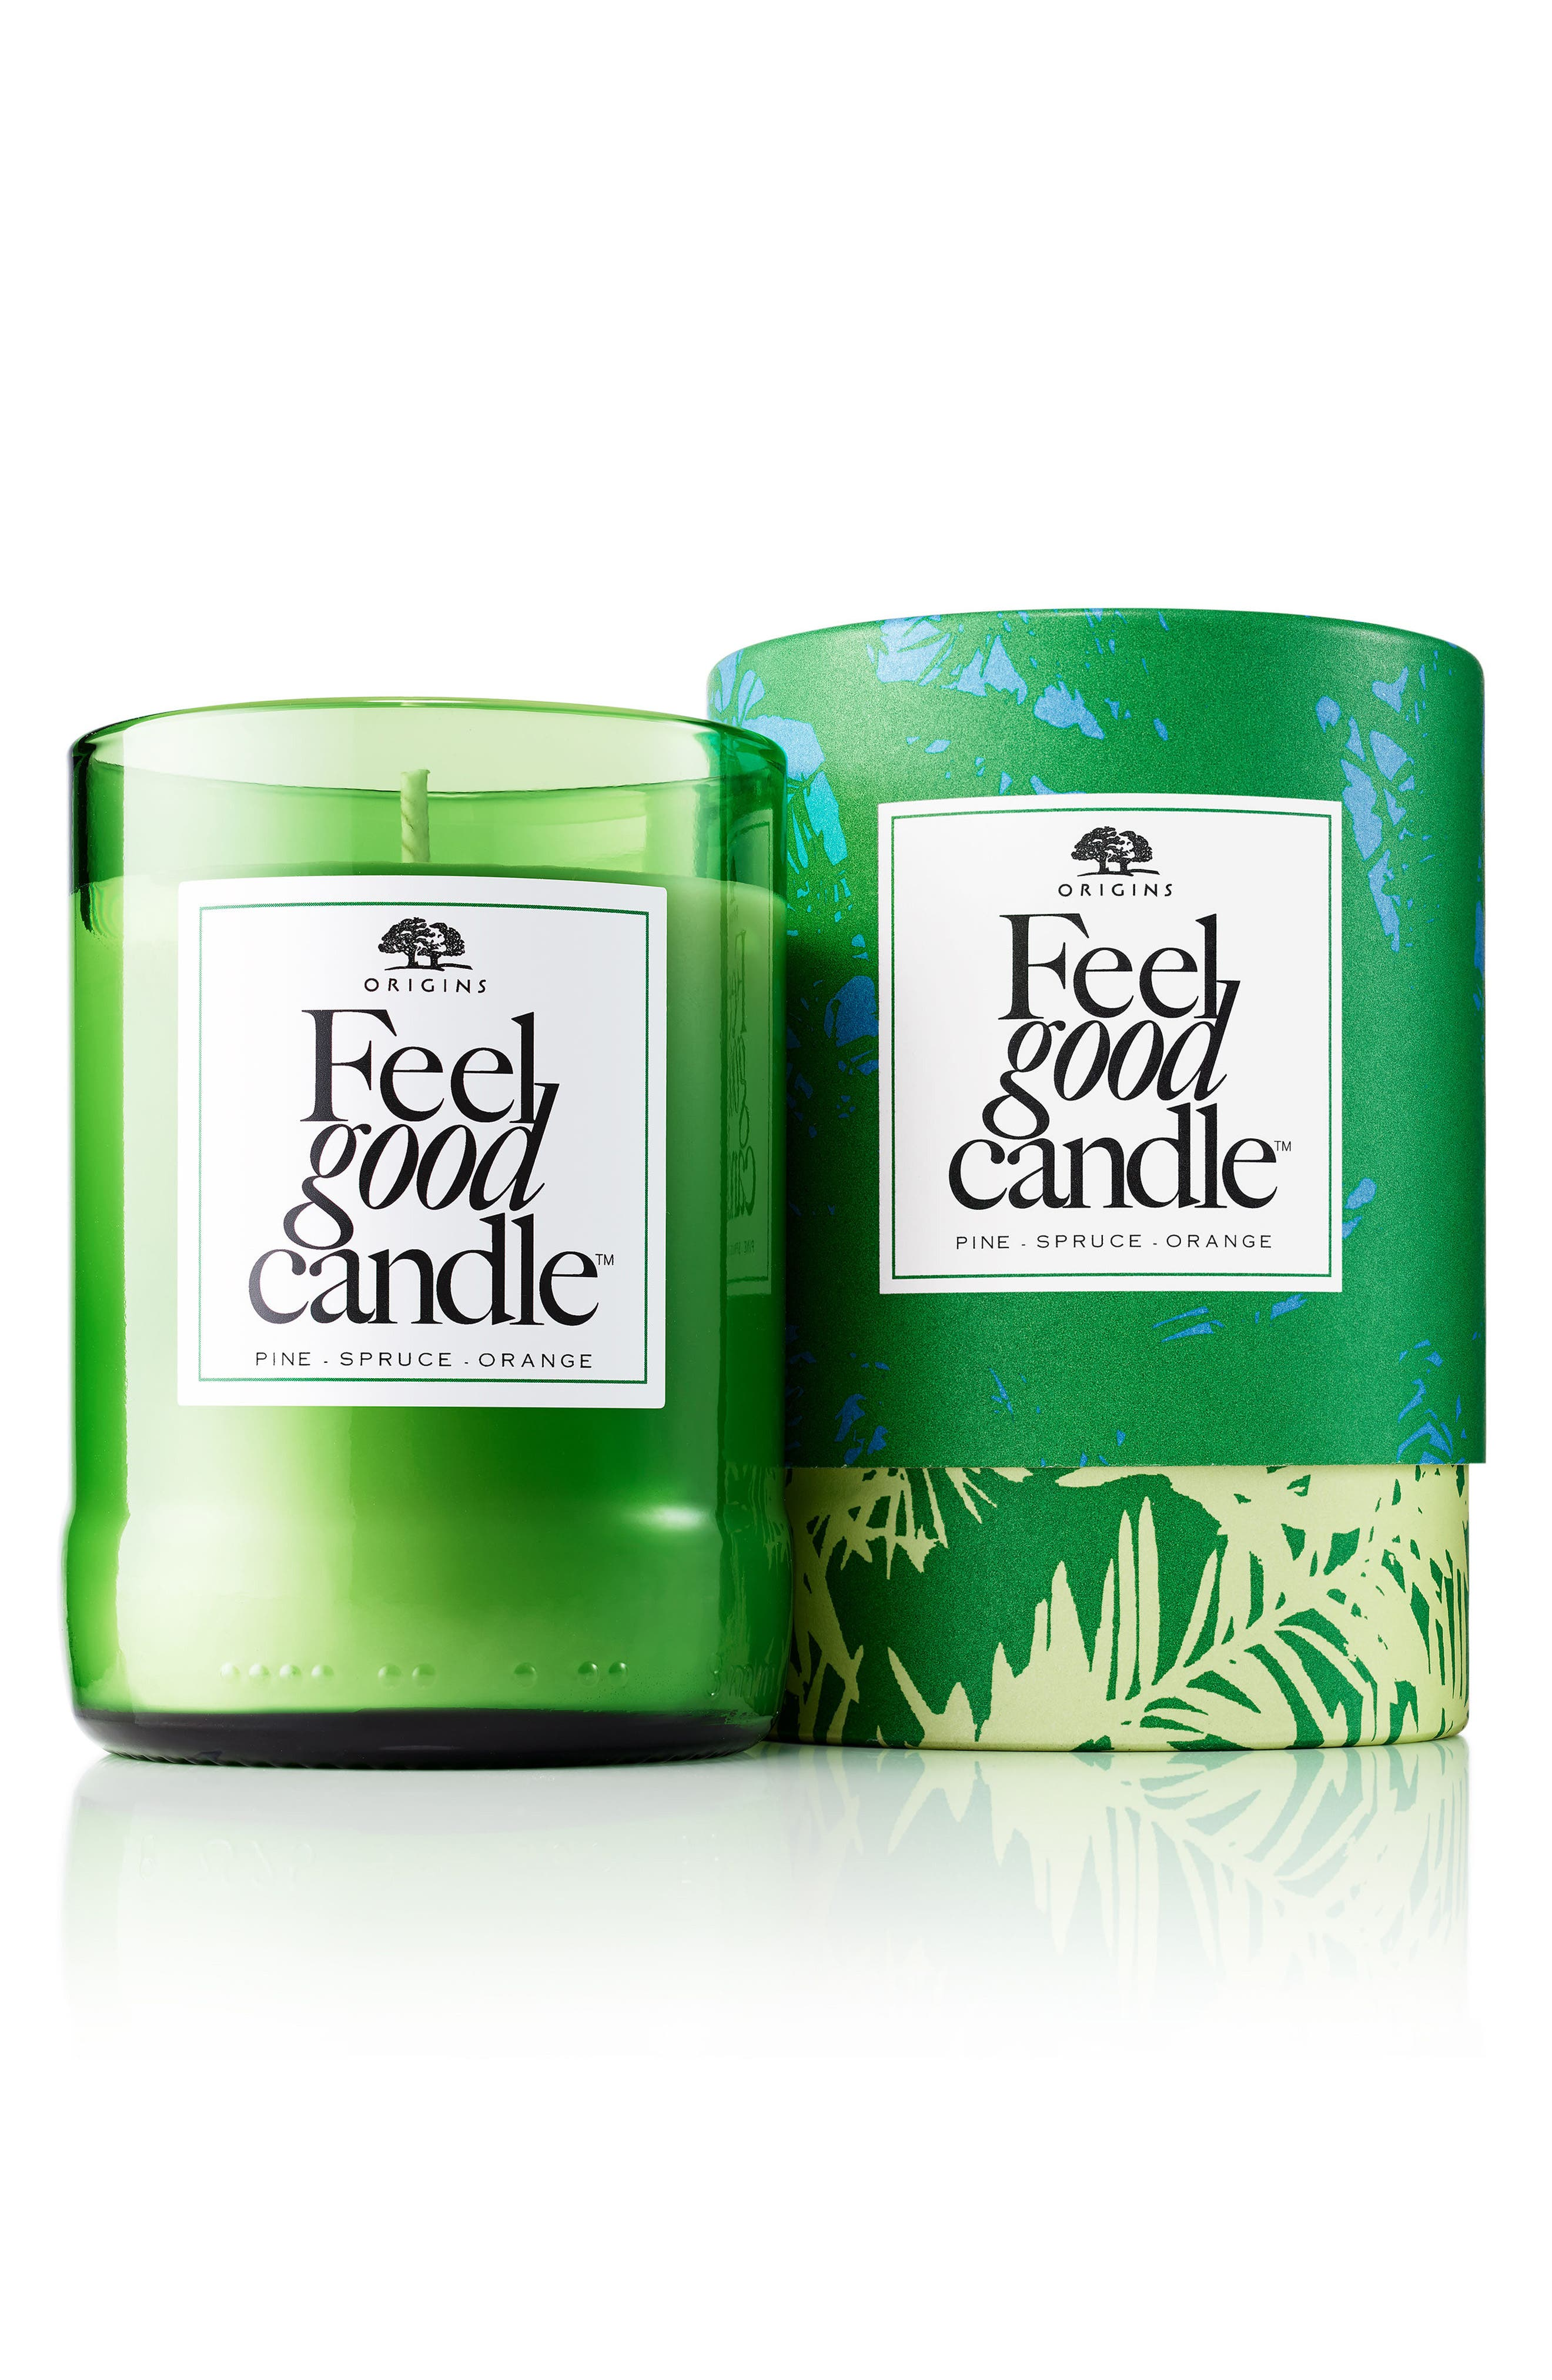 Alternate Image 1 Selected - Origins Pine, Spruce & Orange Feel Good Candle (Limited Edition)